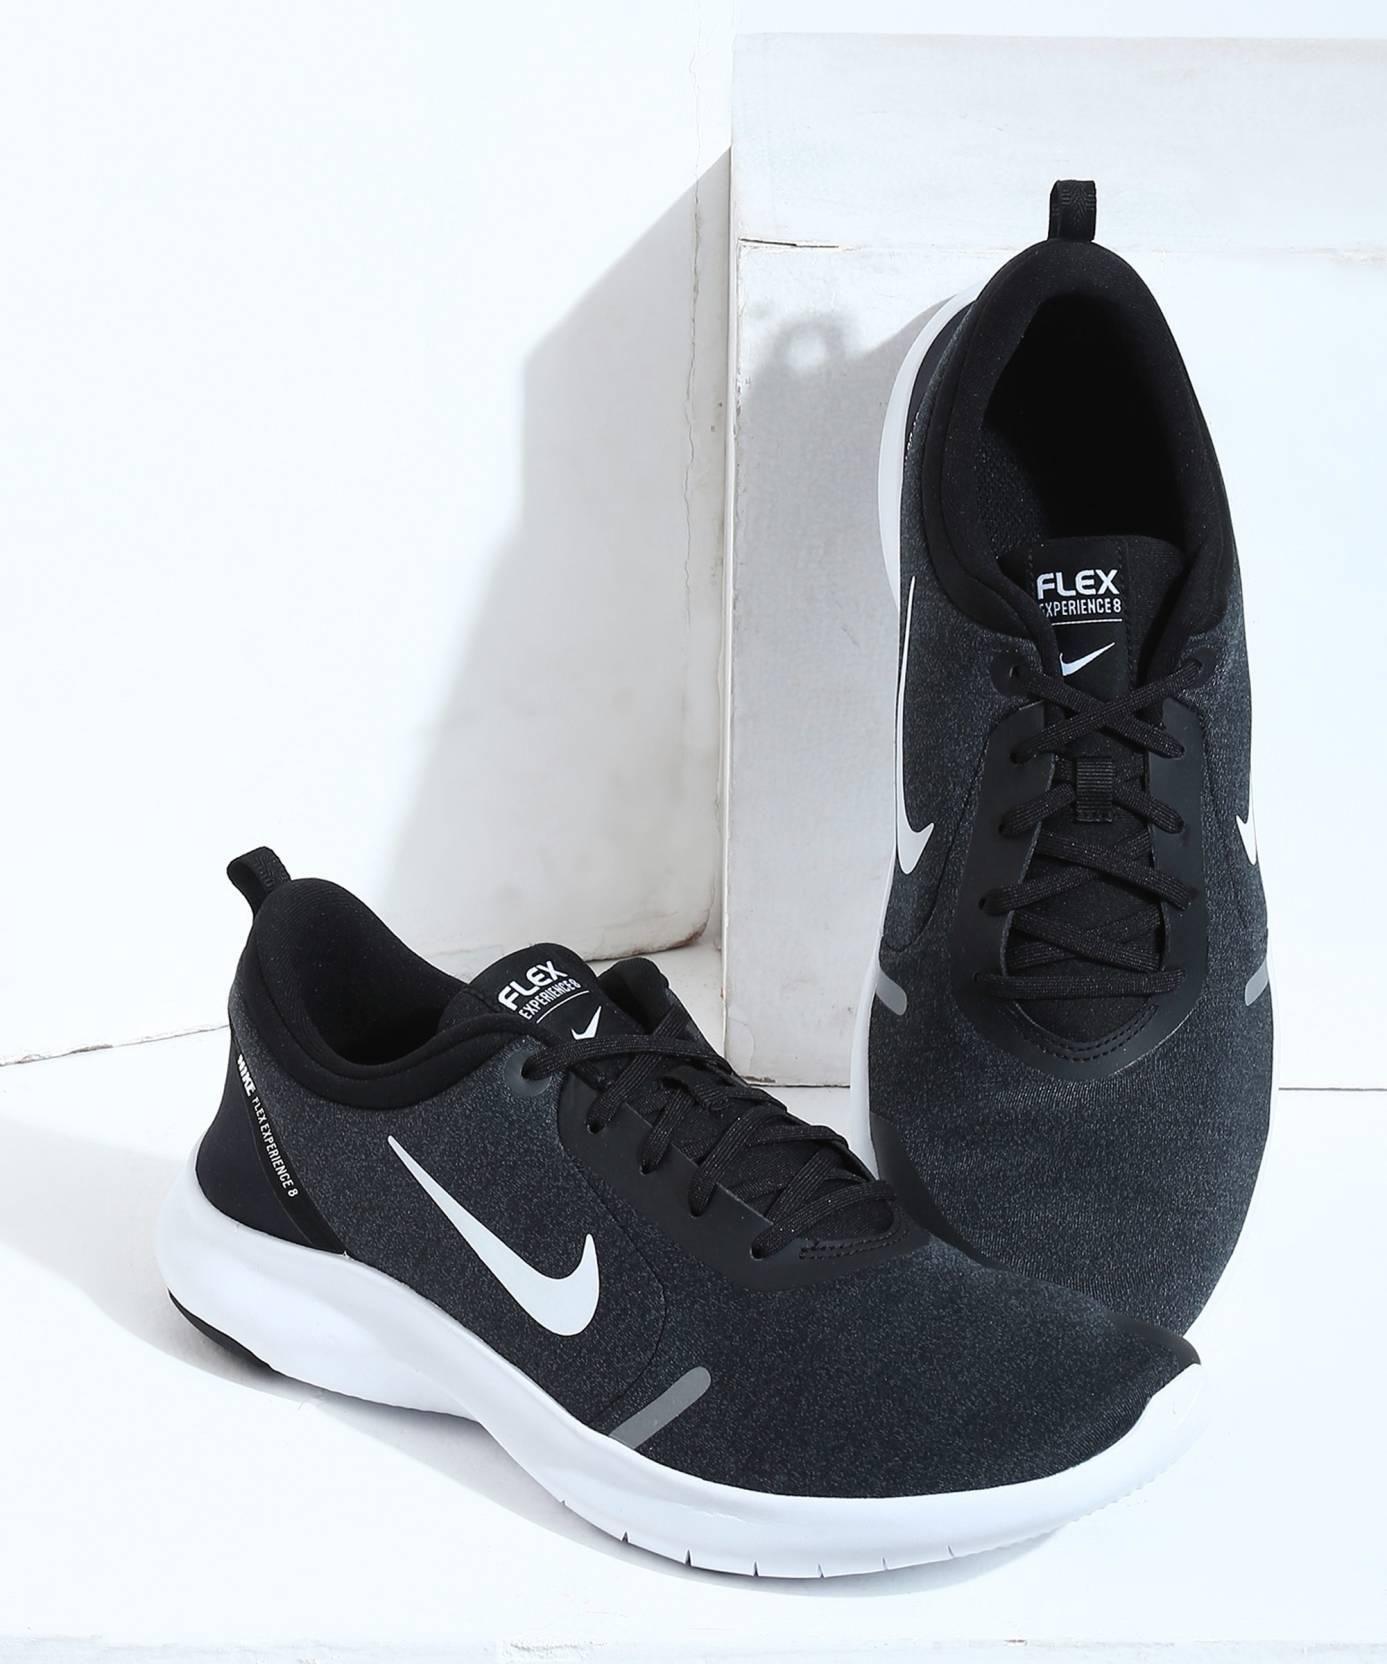 vegetariano Peregrinación Monopolio  Nike Shoes Price List in India on 10 Nov 2020 | Buy Shoes Online |  PriceDekho.com